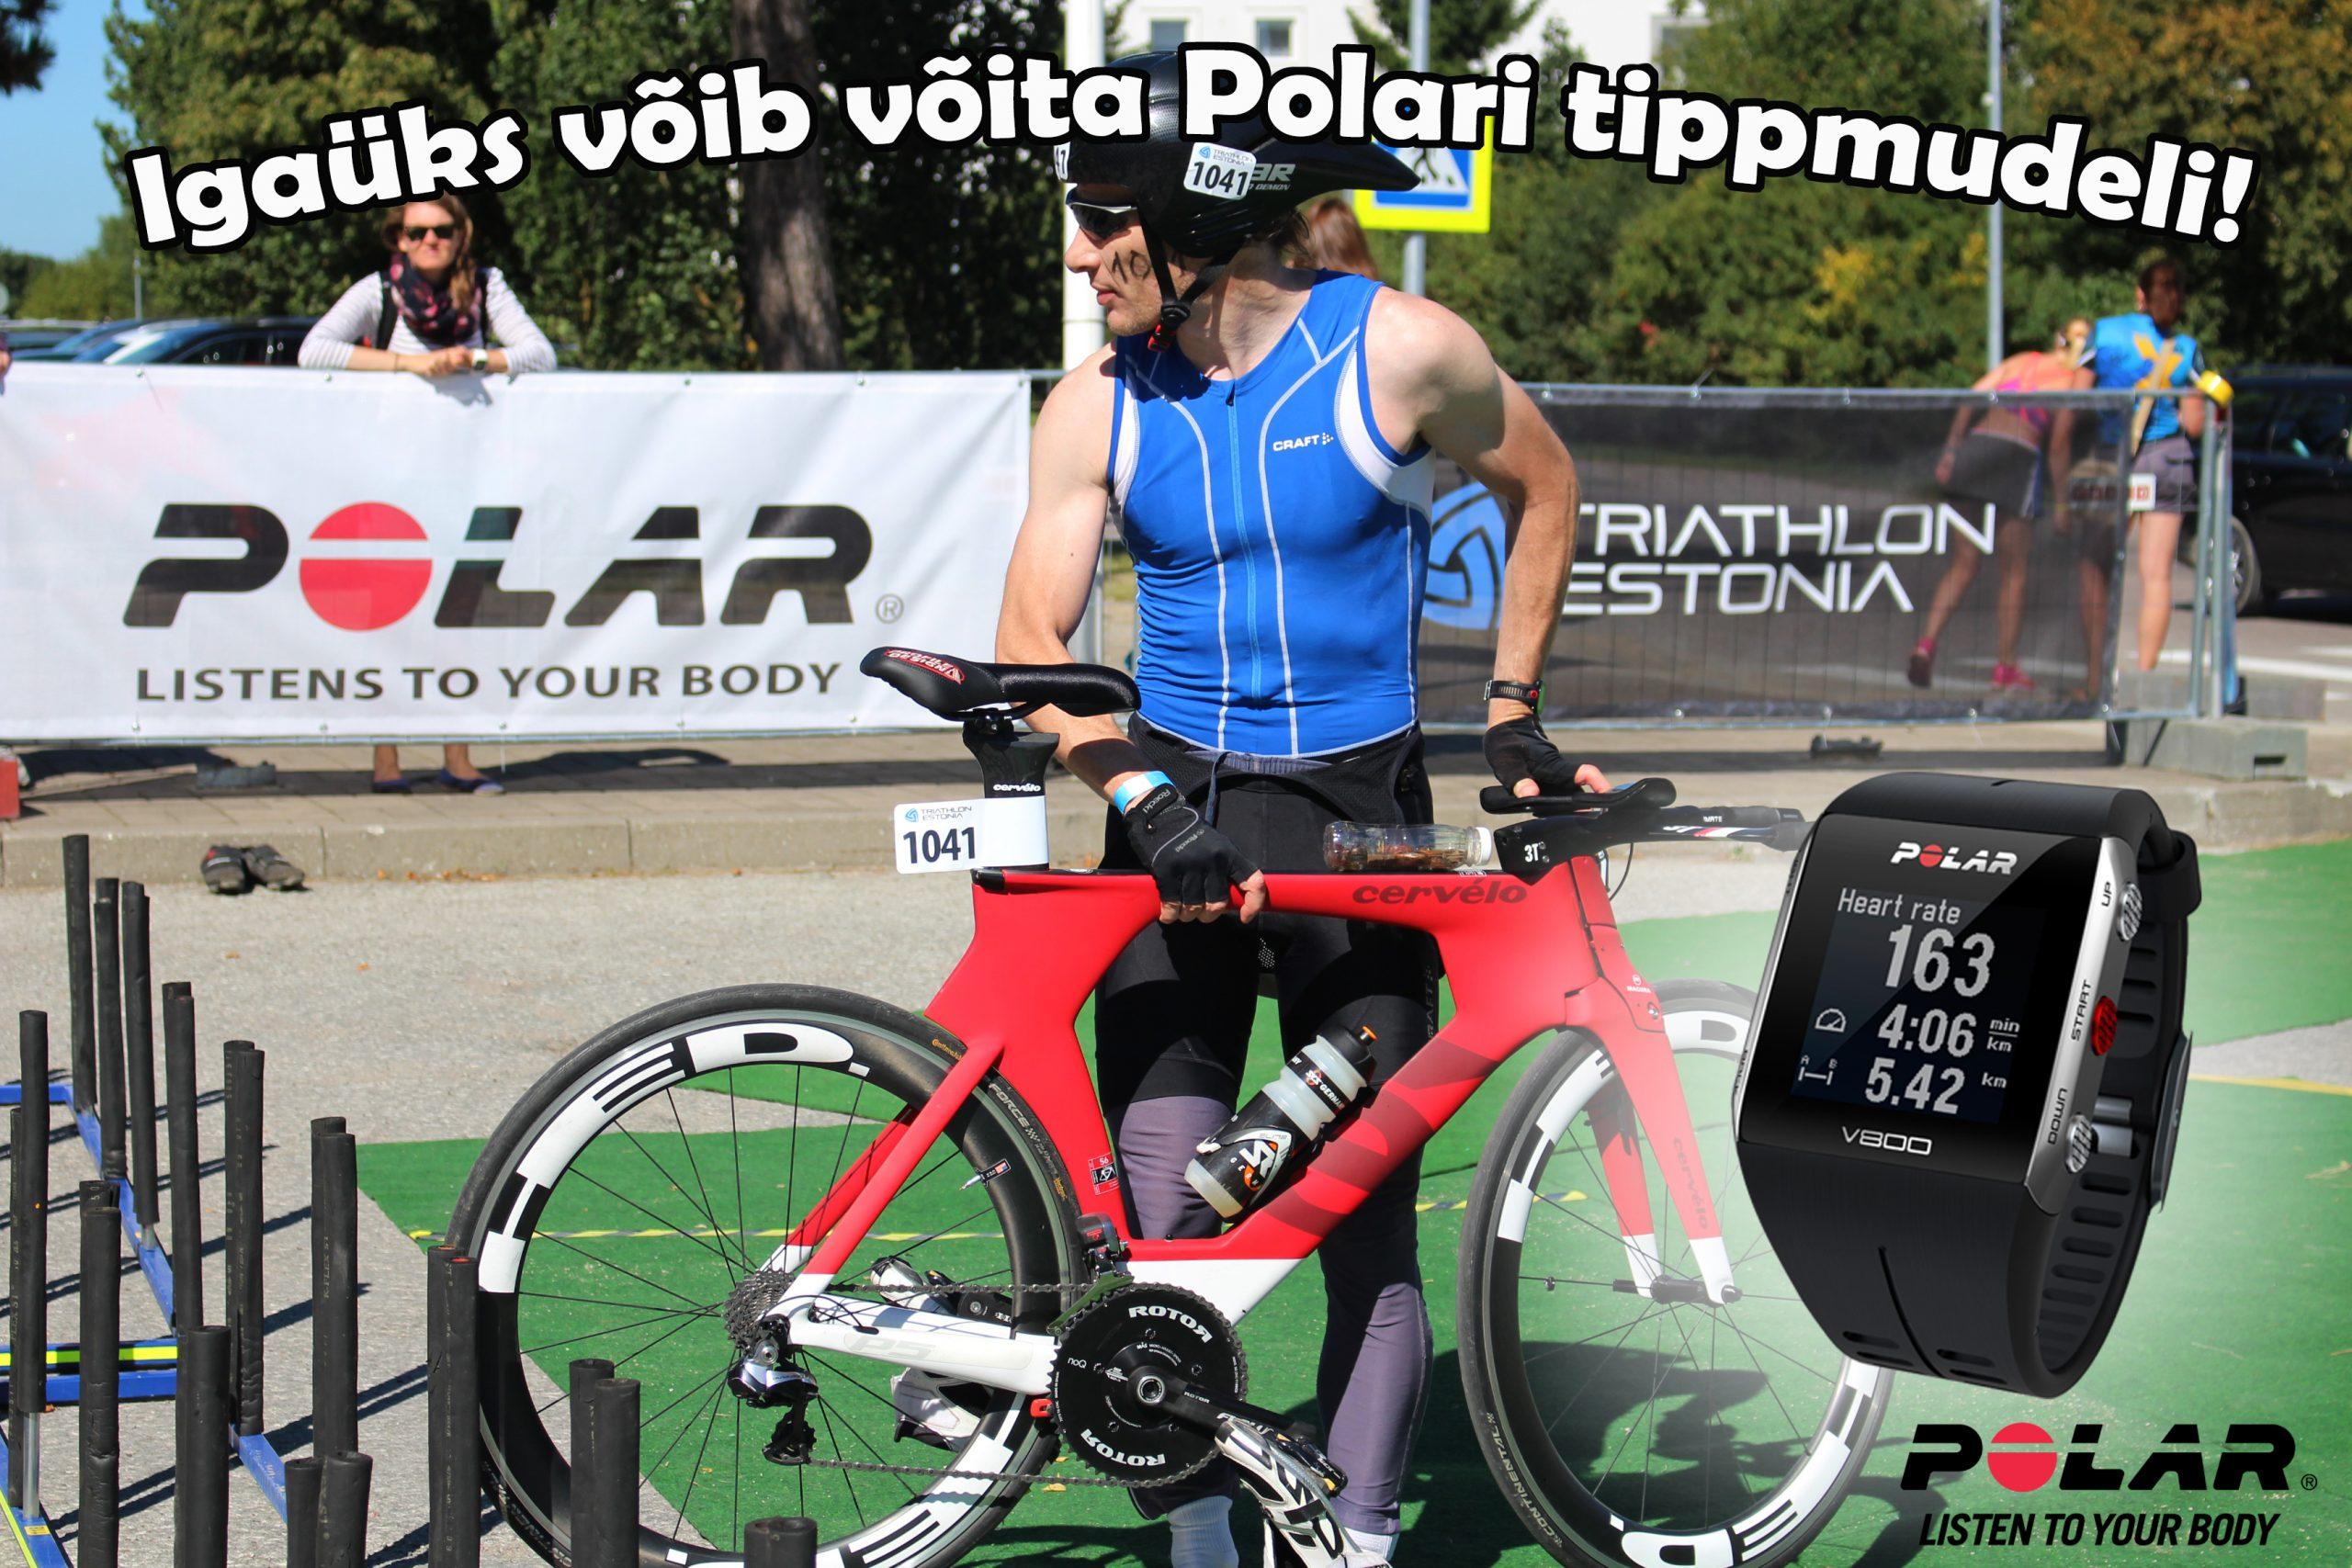 Prizes from Polar - Призовой стол от Polar